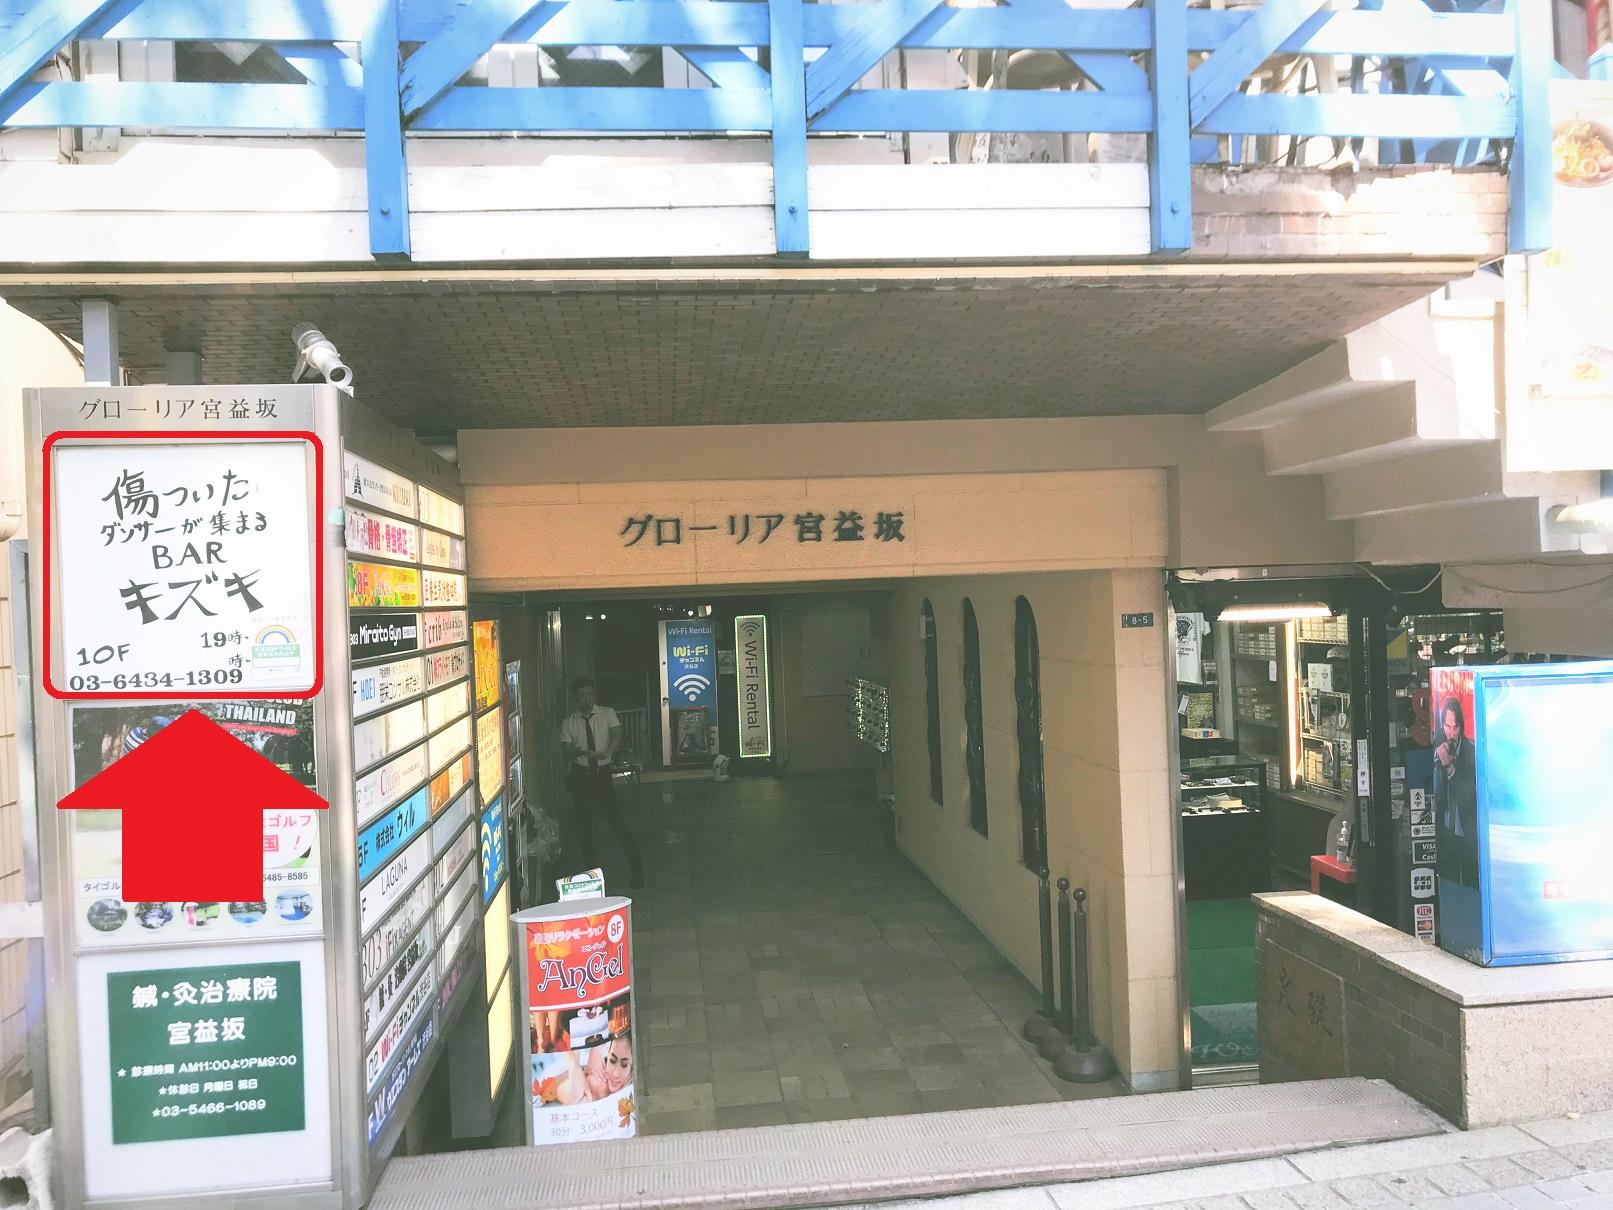 Lightsbygeny渋谷宮益坂セルフエステハイフ初回体験体験談口コミ